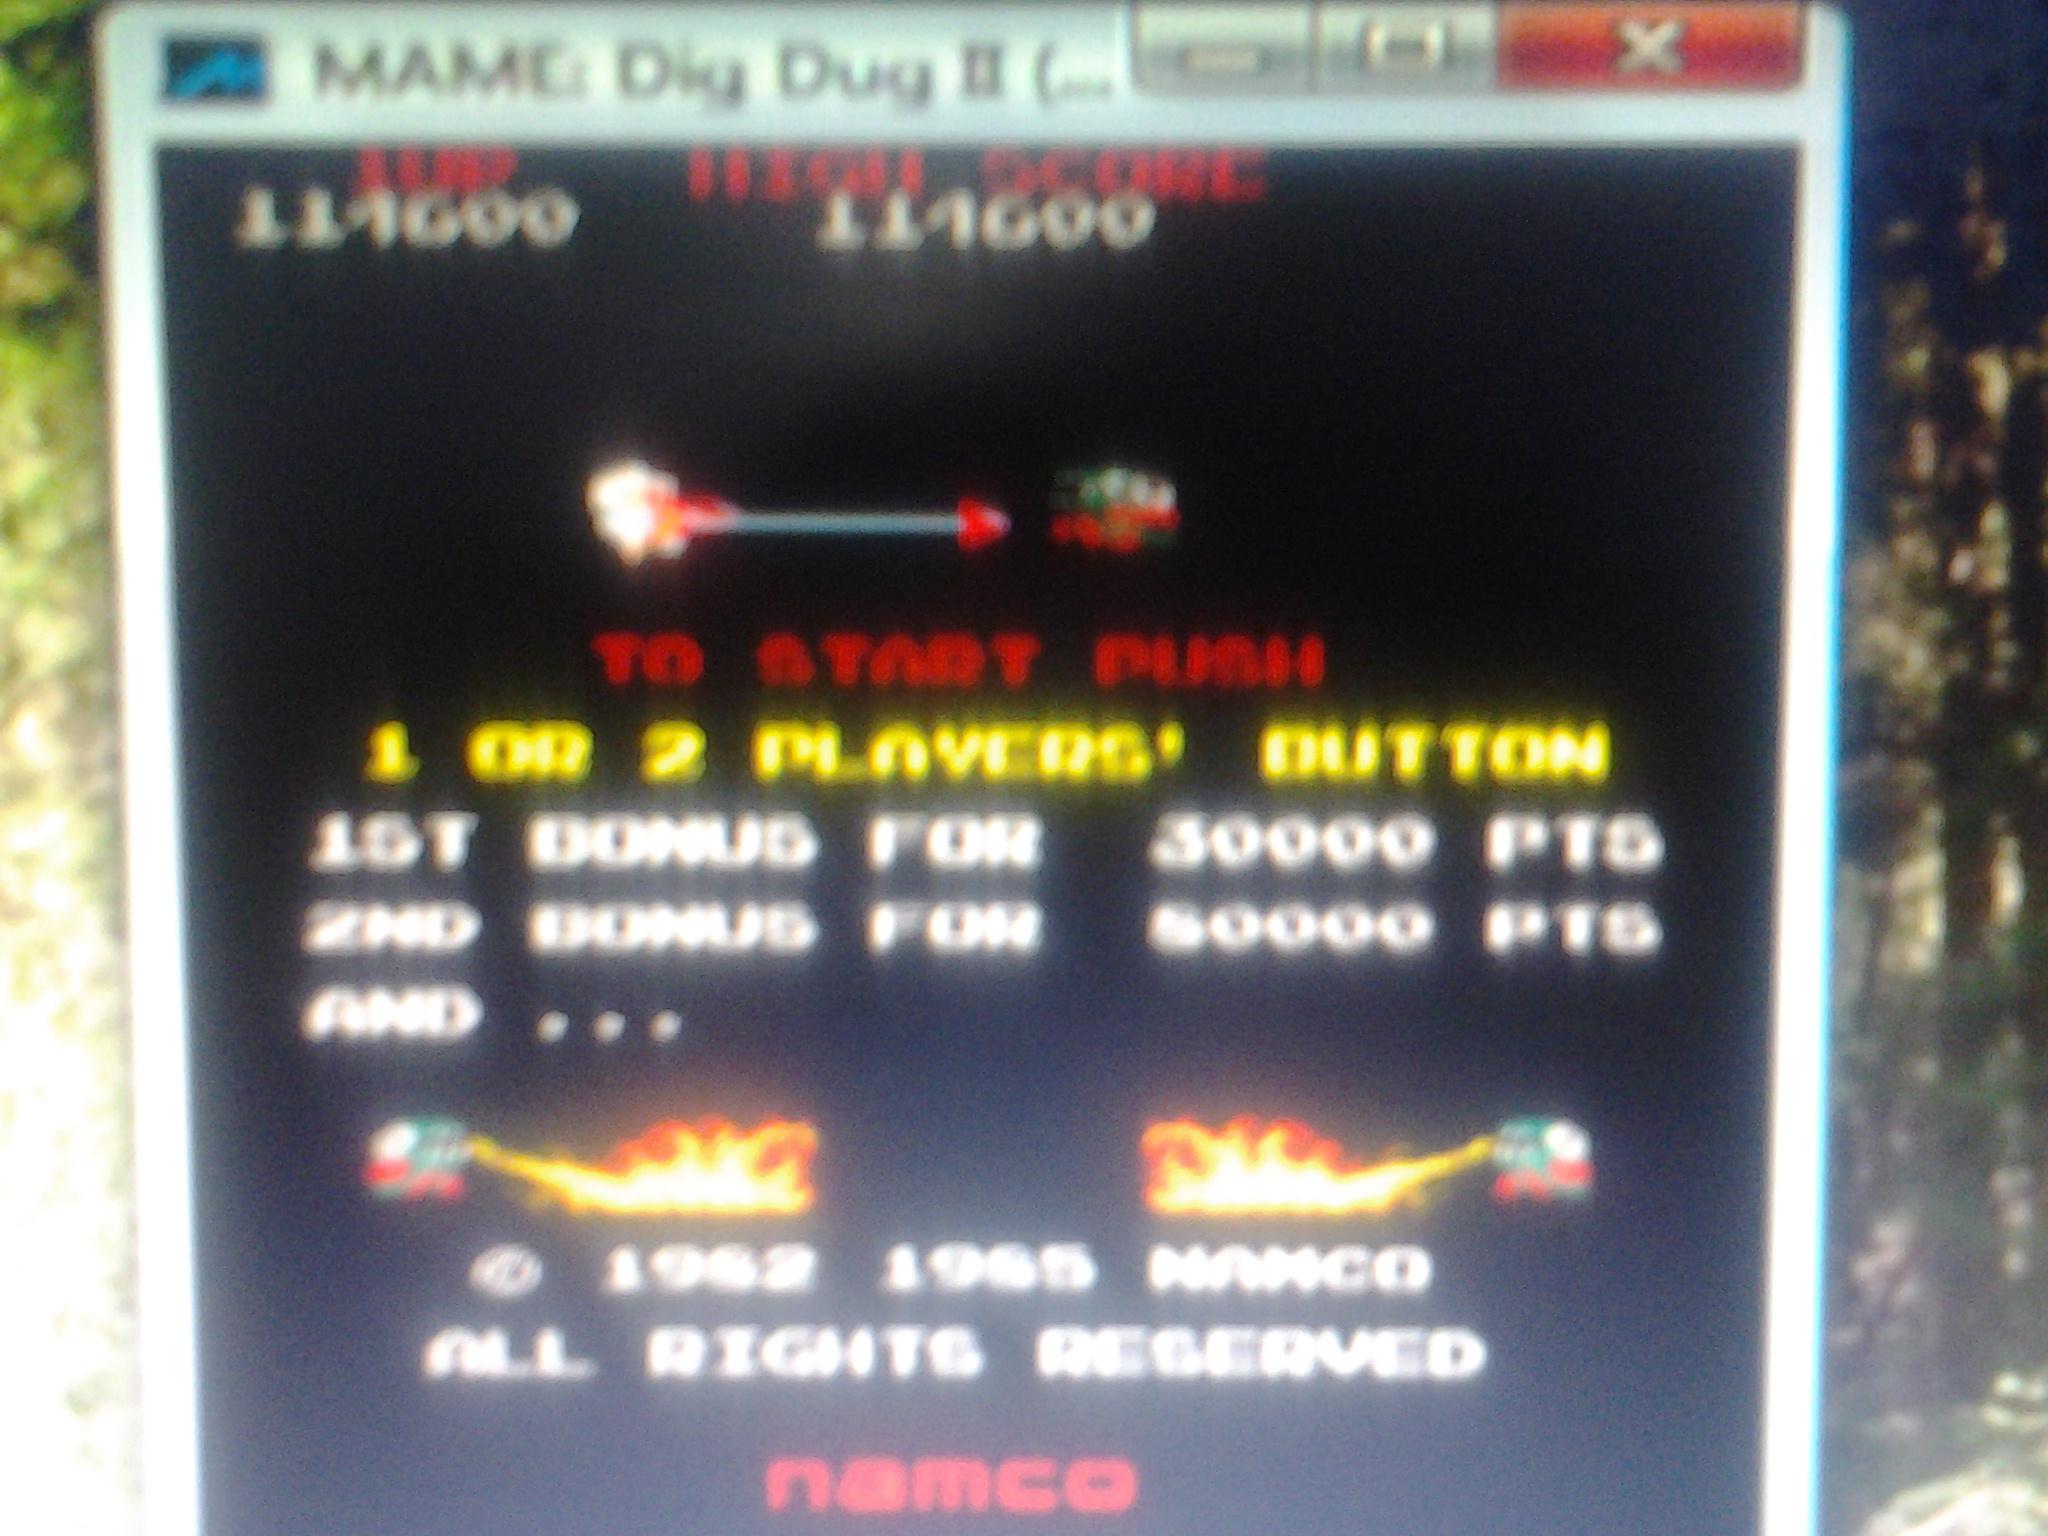 Dig Dug II 114,600 points